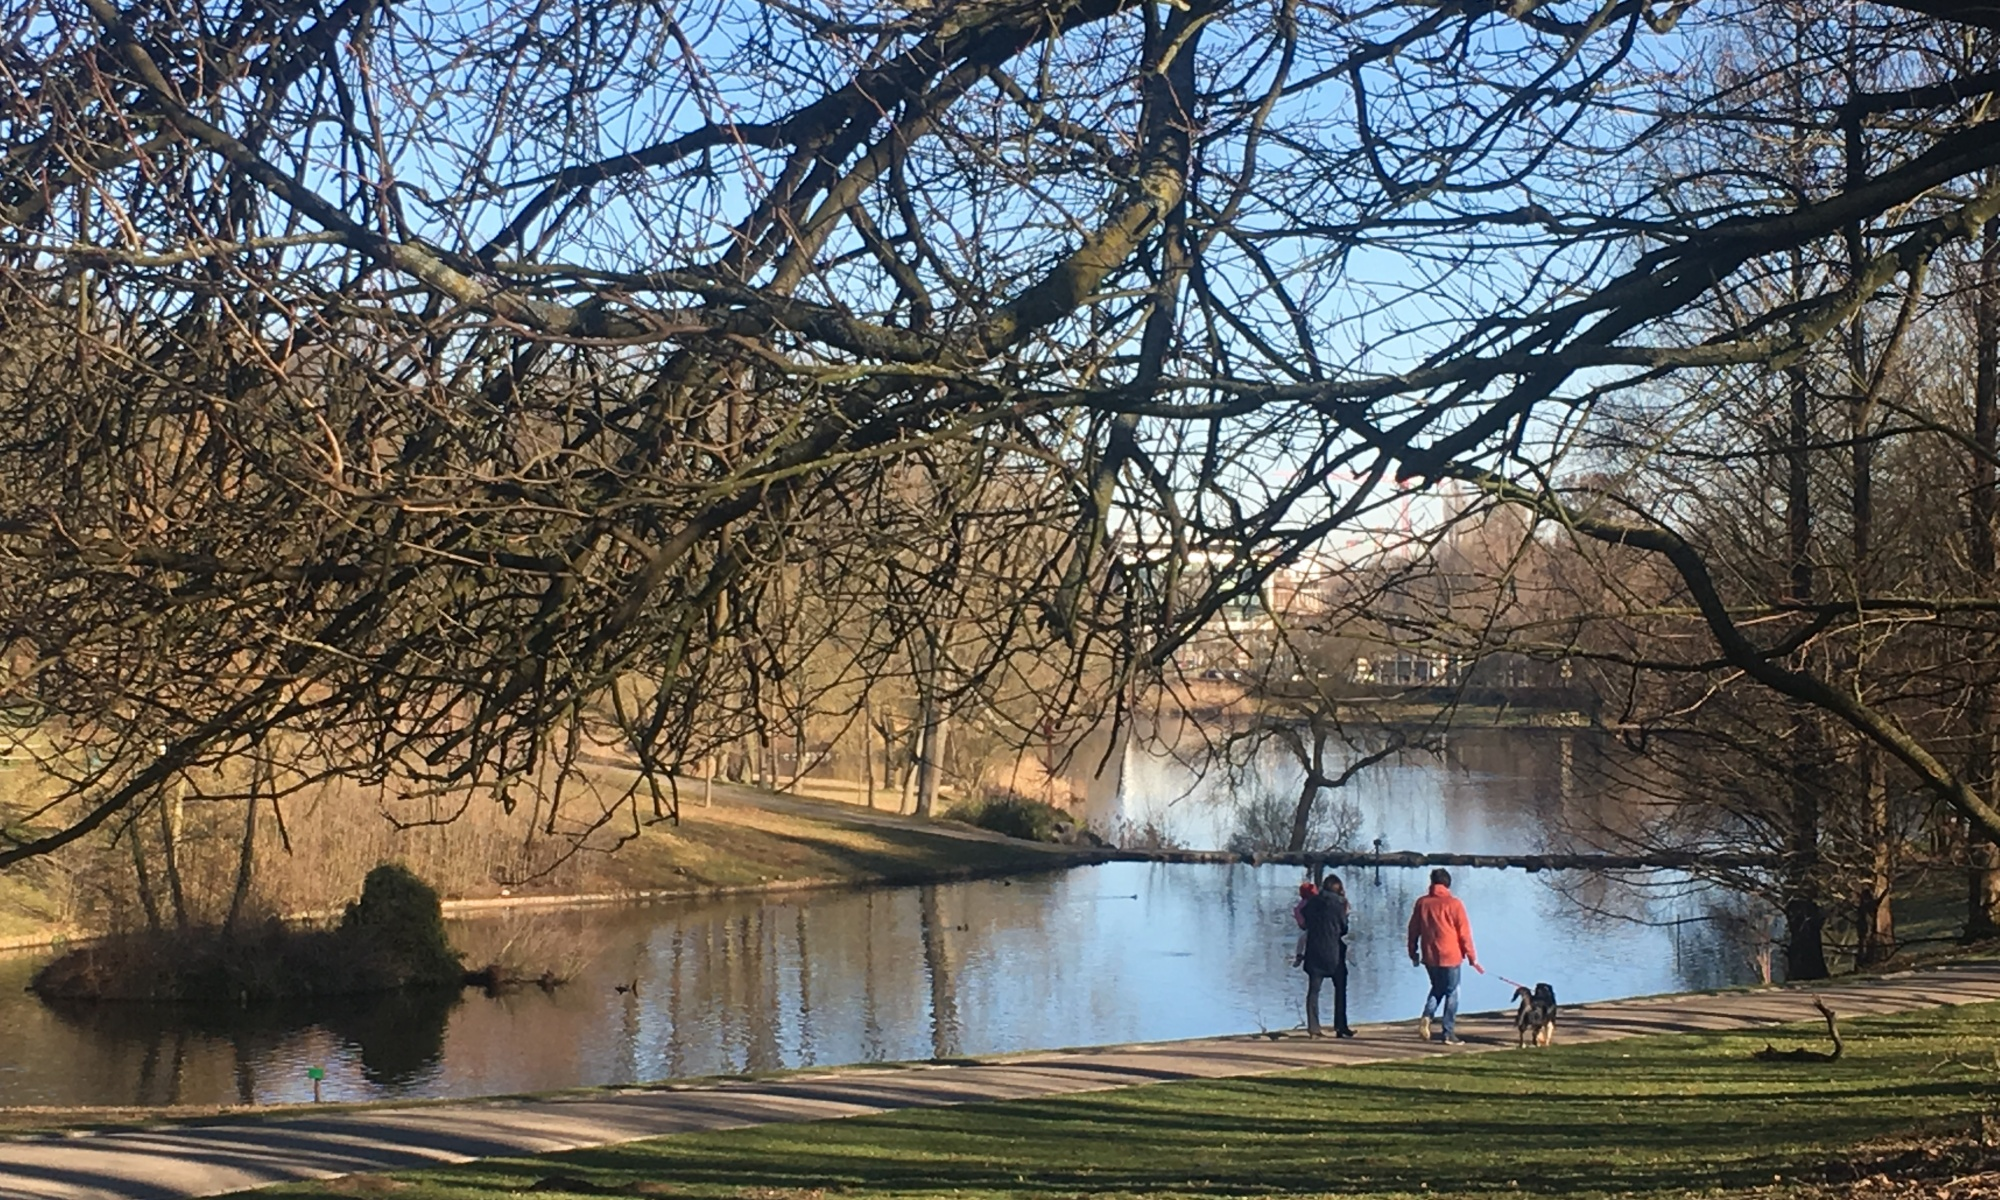 Plimbare în parc, Woluwe - St. Lambert, Bruxelles